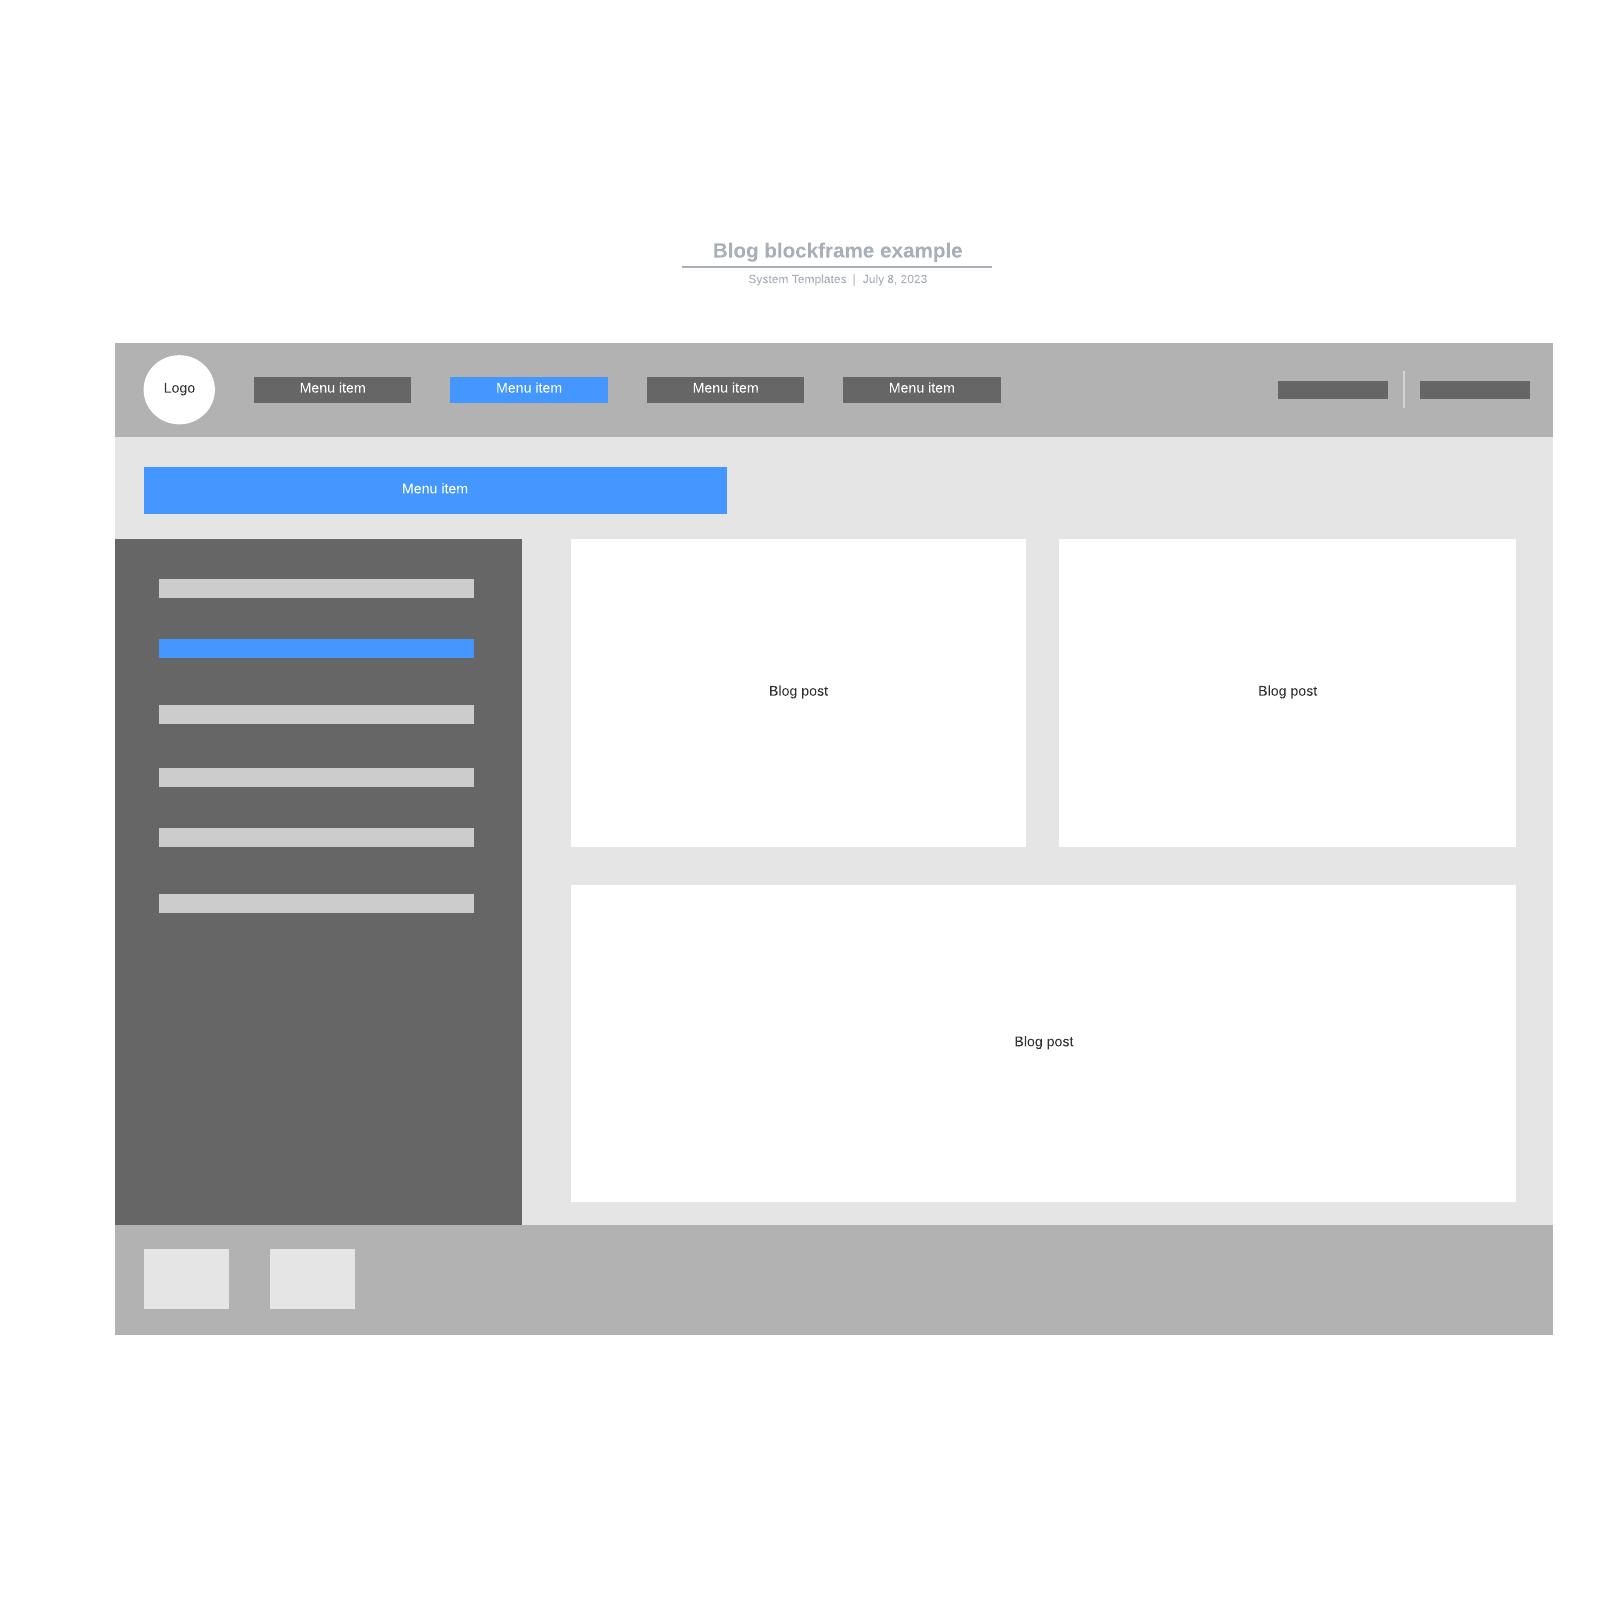 Blog blockframe example